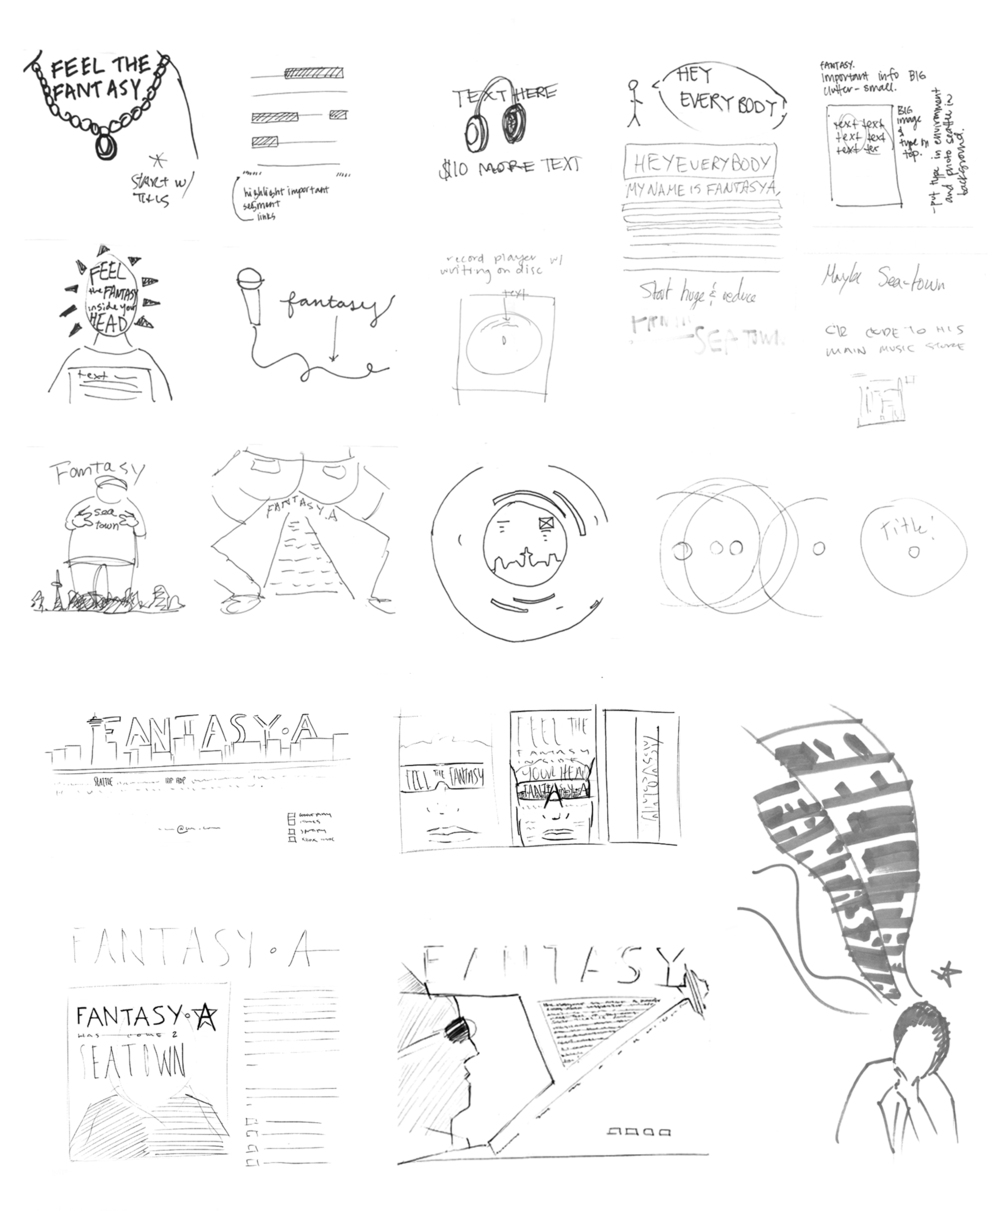 fantasyA_sketches